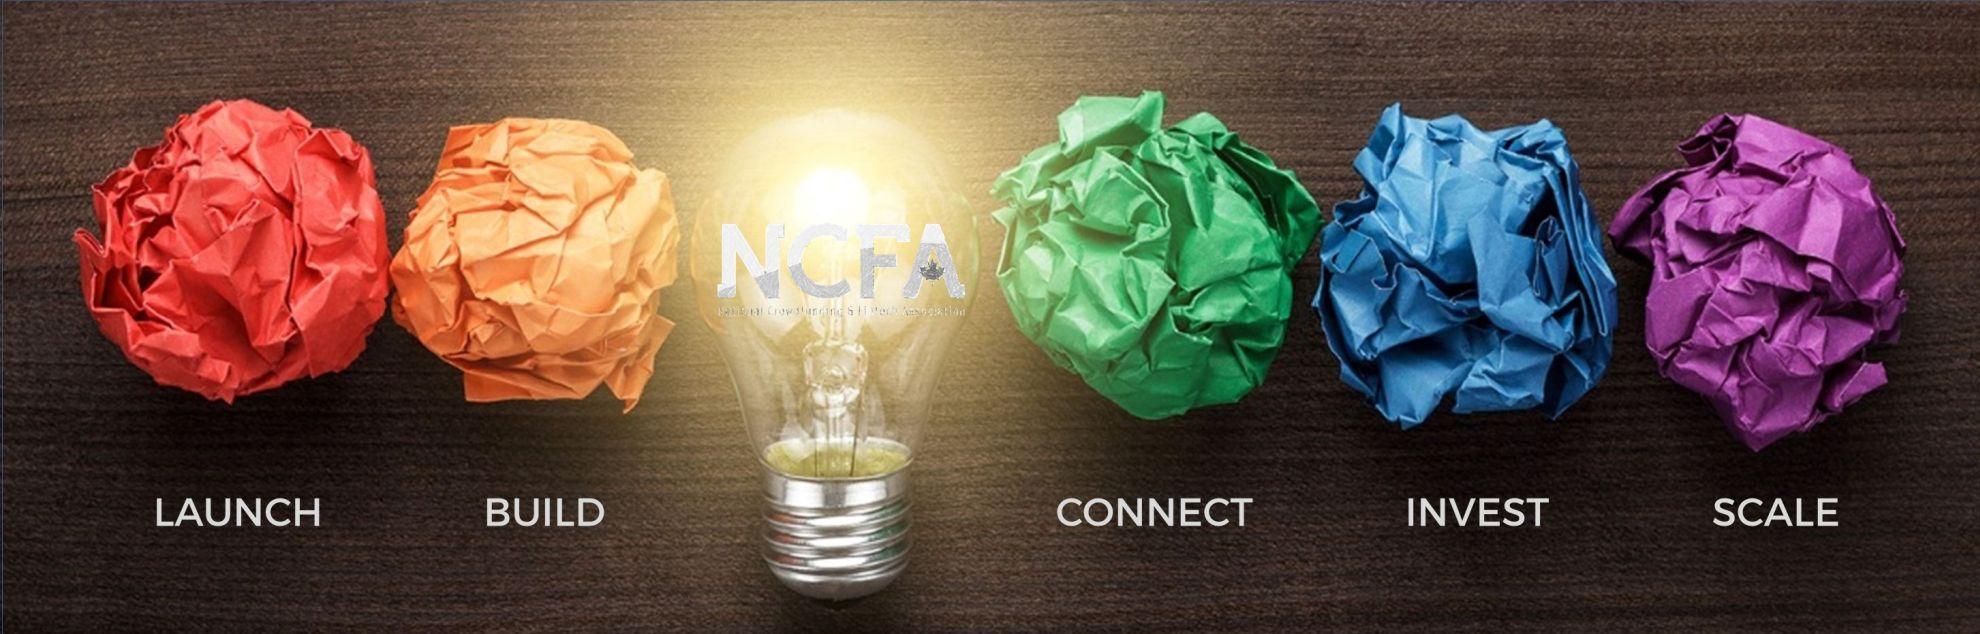 NCFA Innovation 2019